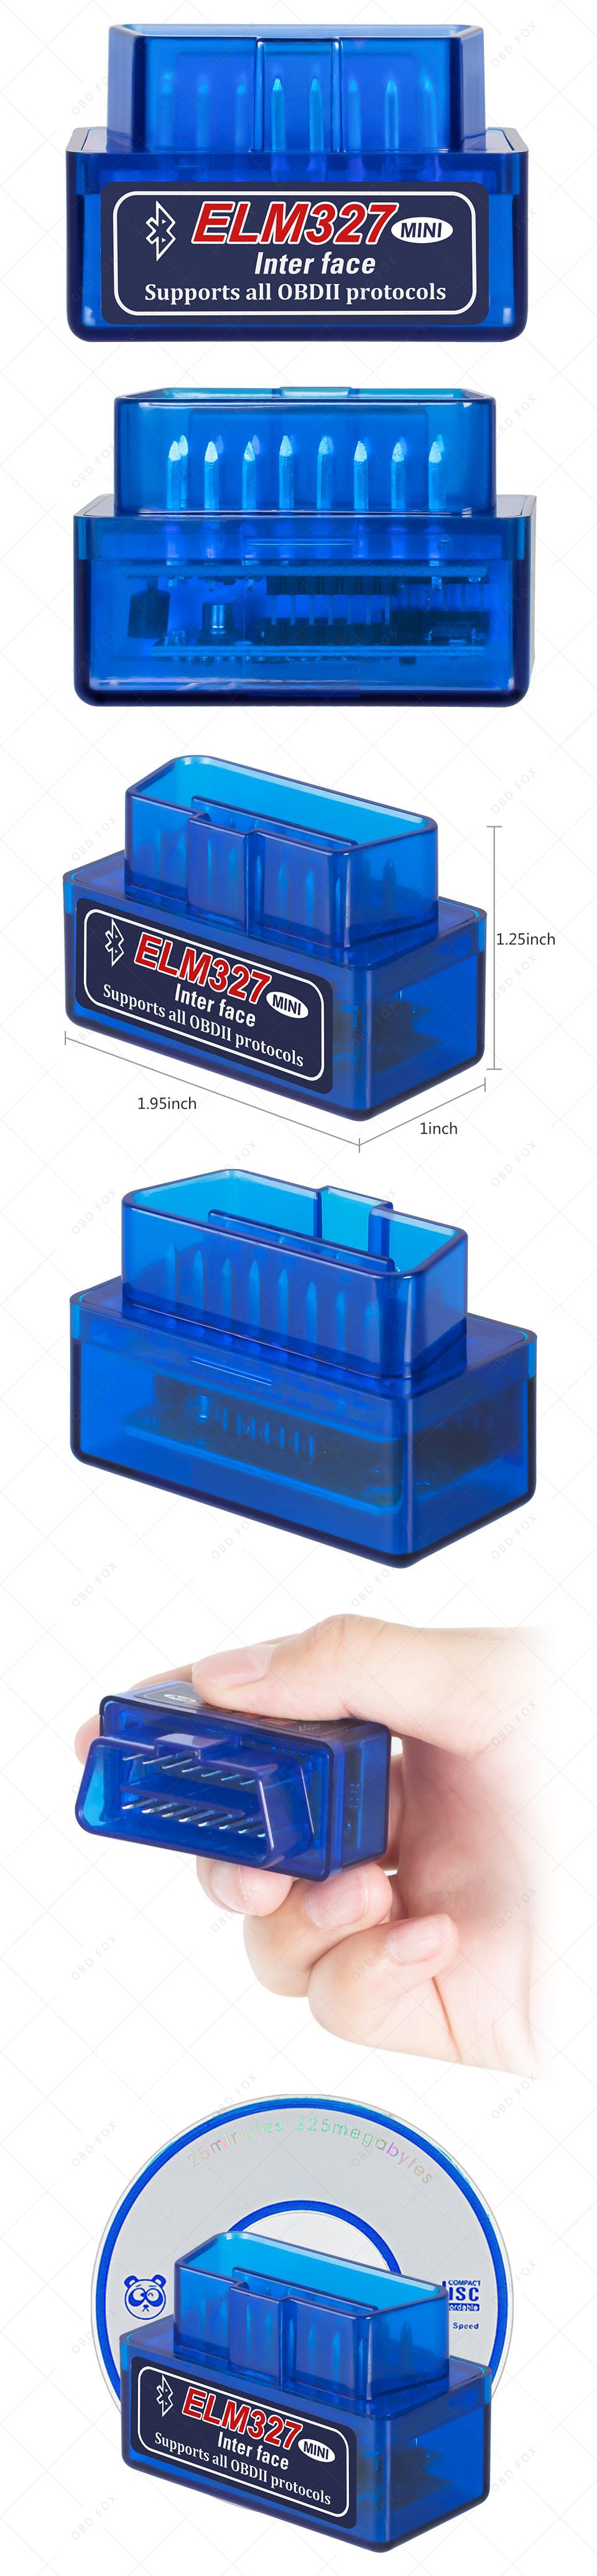 super mini elm327 V1.5 960